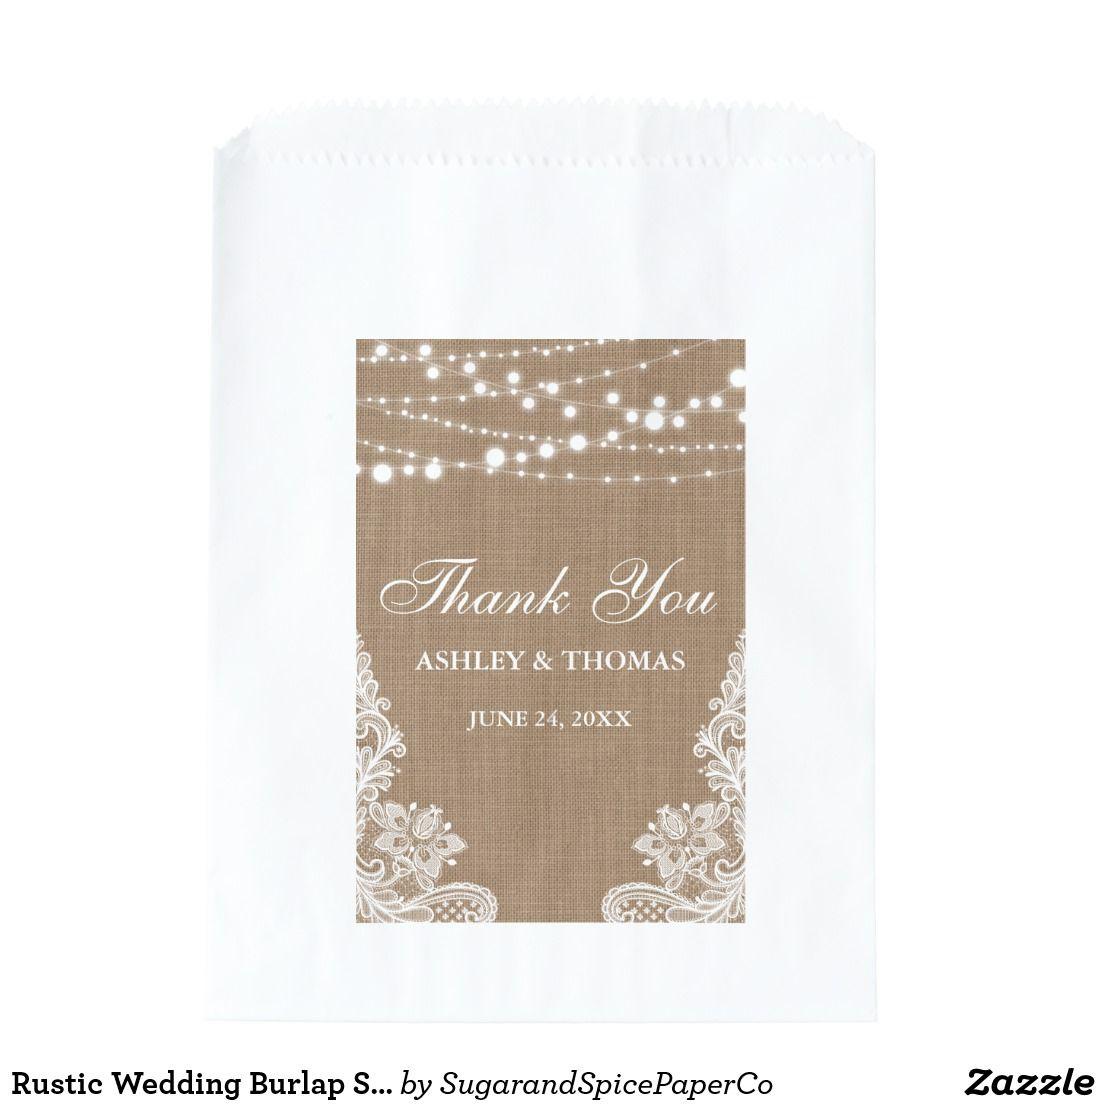 Rustic Wedding Burlap String Lights Lace Thank You Favor Bag ...